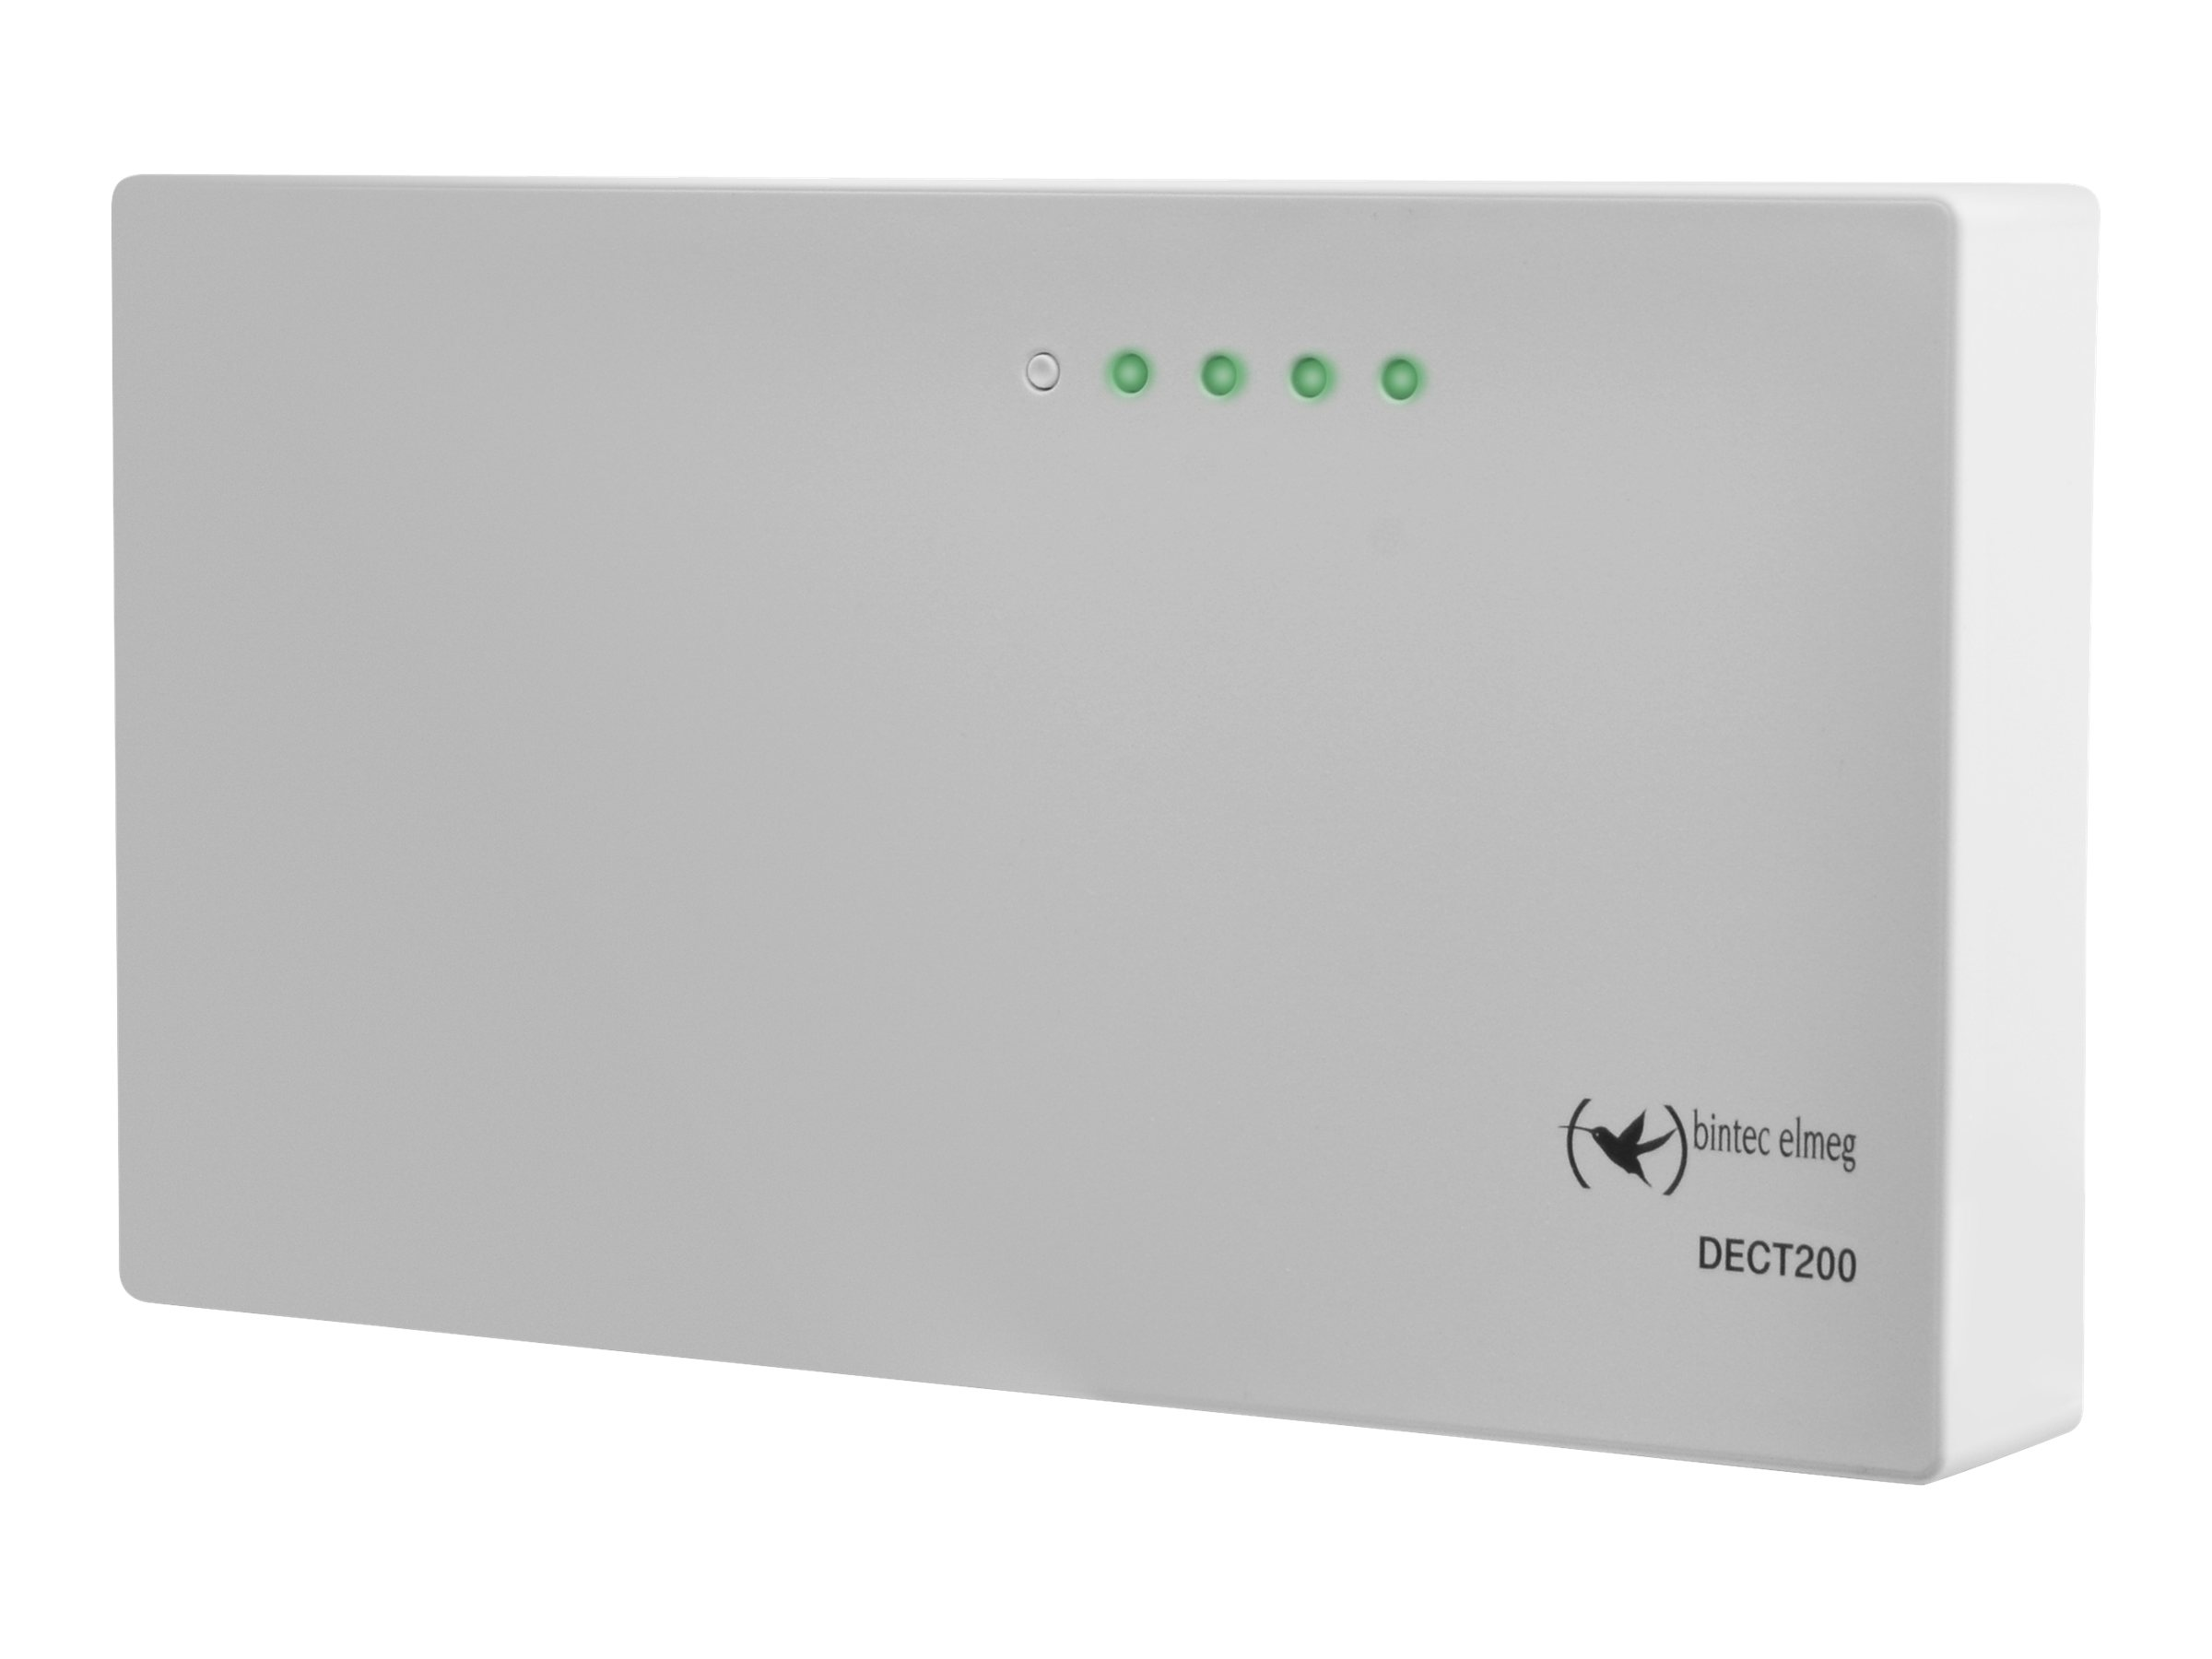 bintec elmeg DECT200 - Basisstation für kabelloses VoIP-Telefon